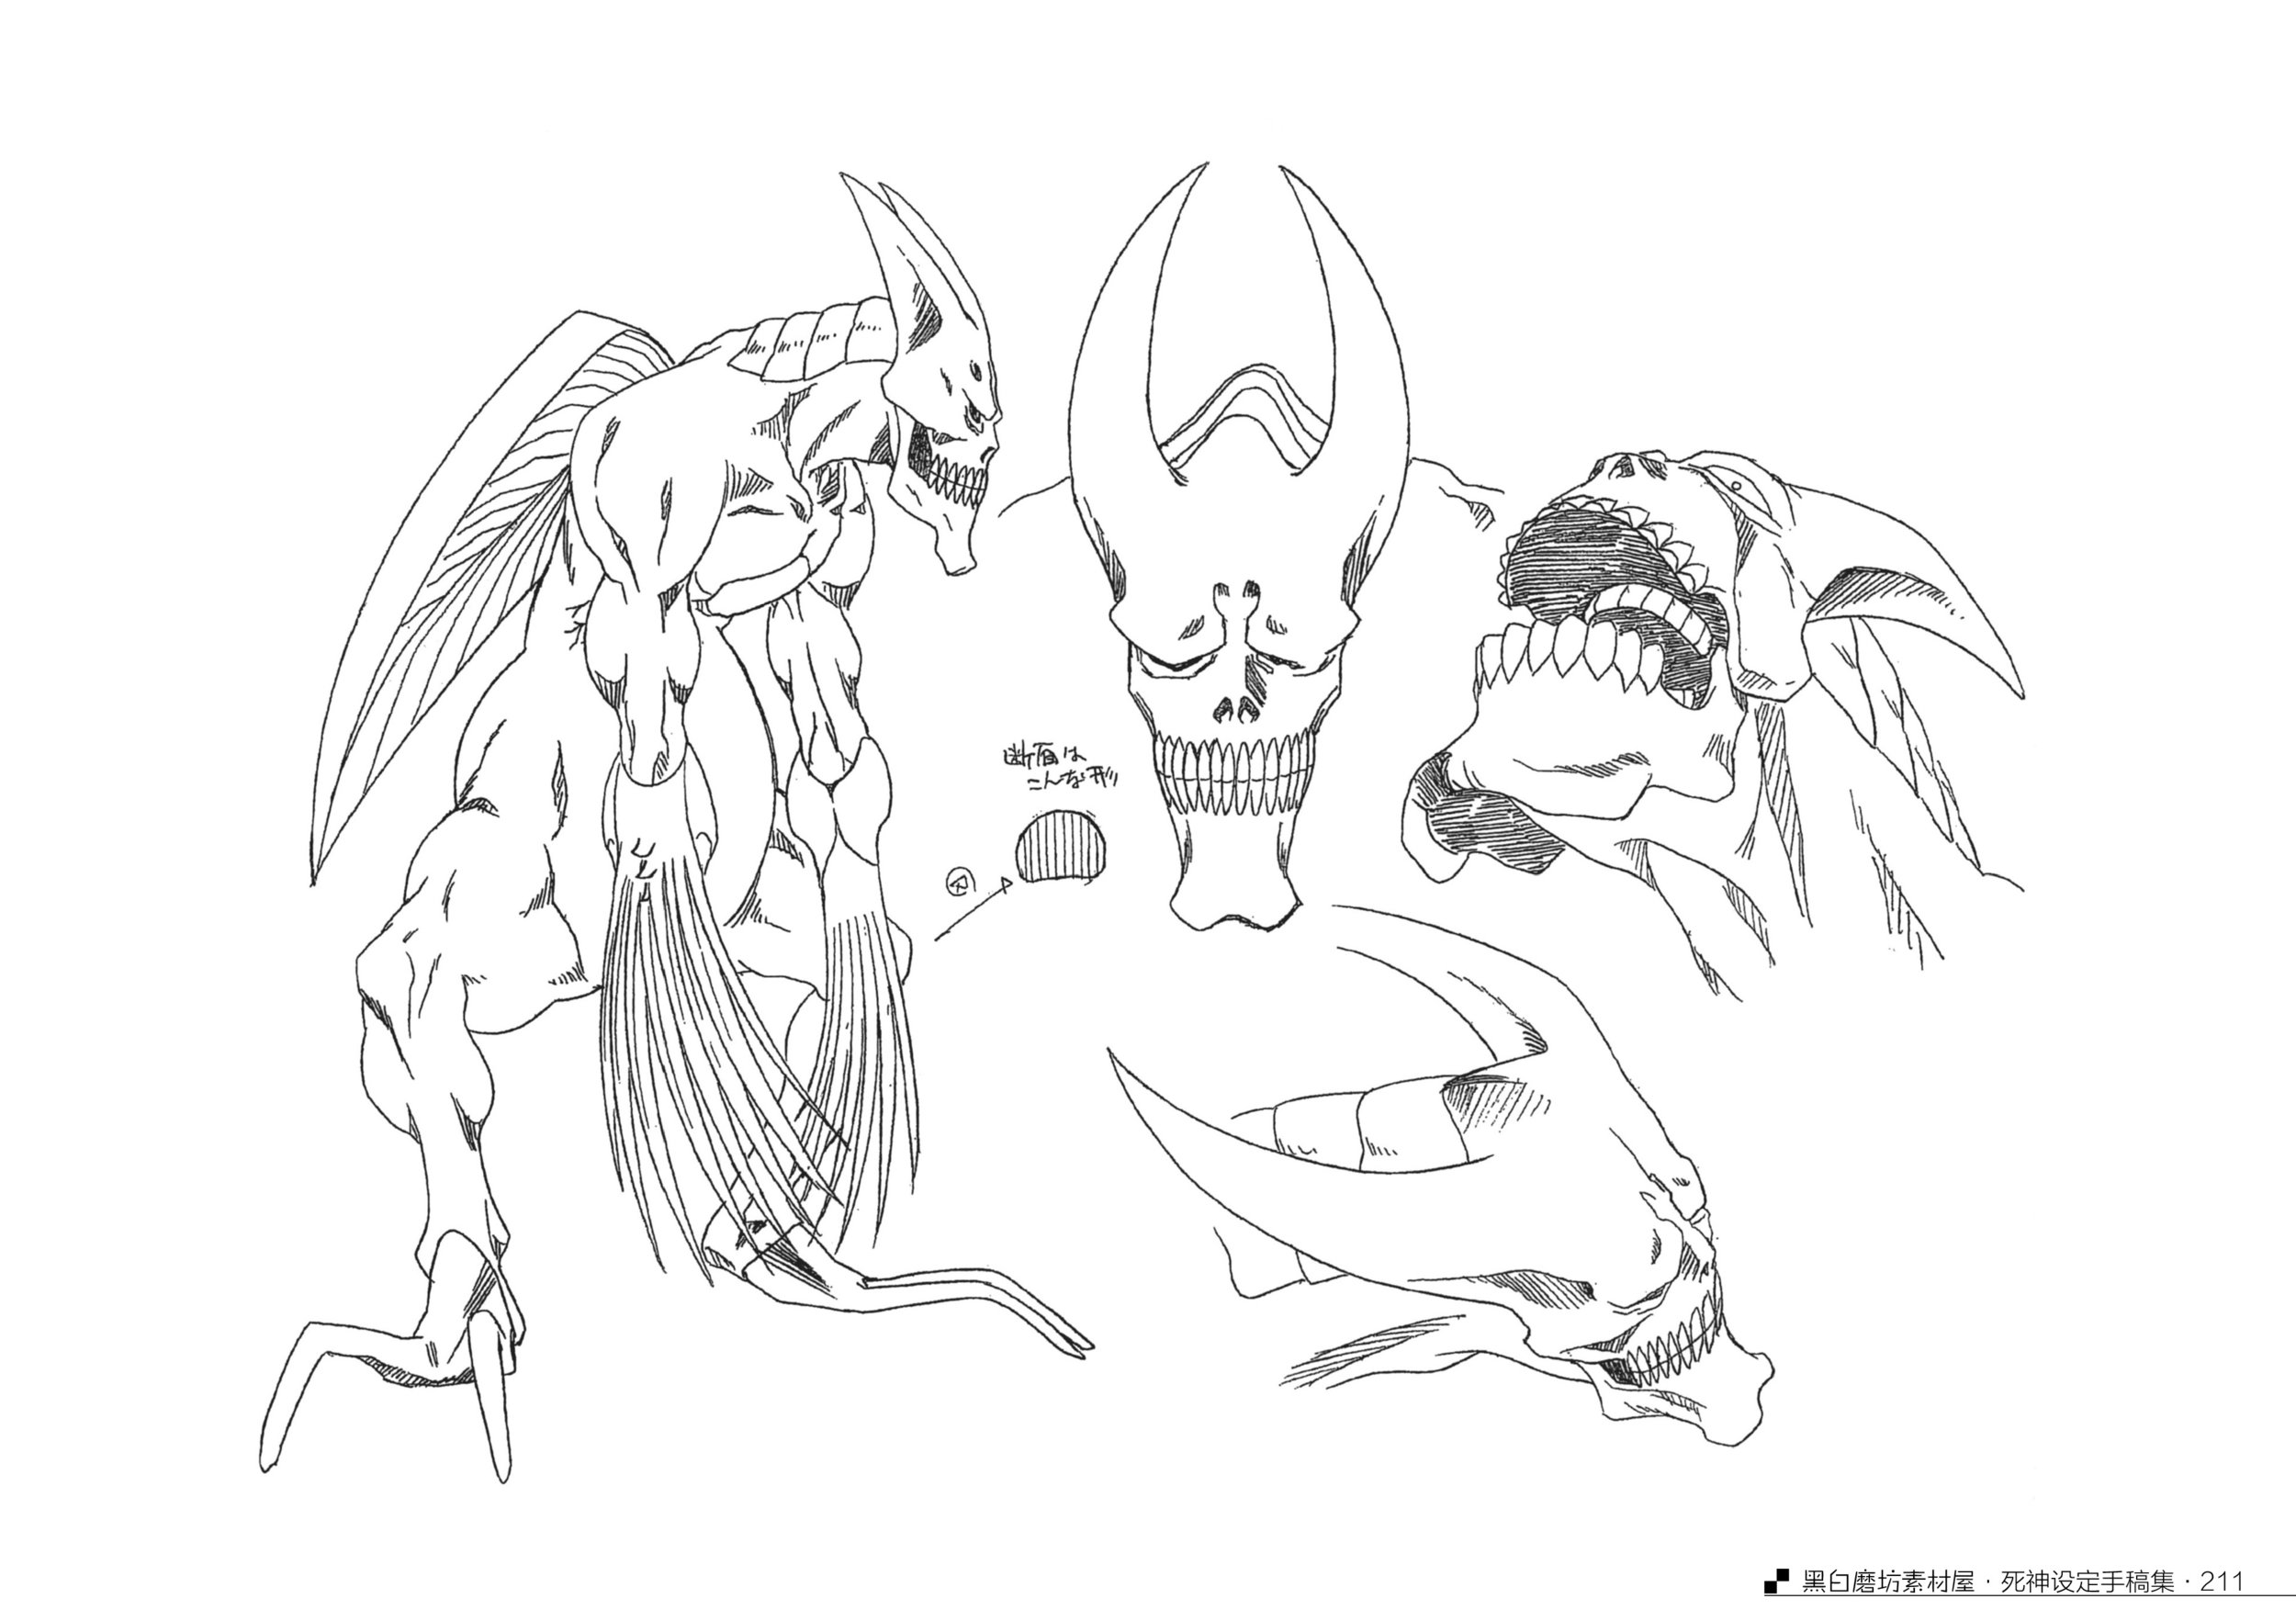 Art of the Bleach A - 189.jpg